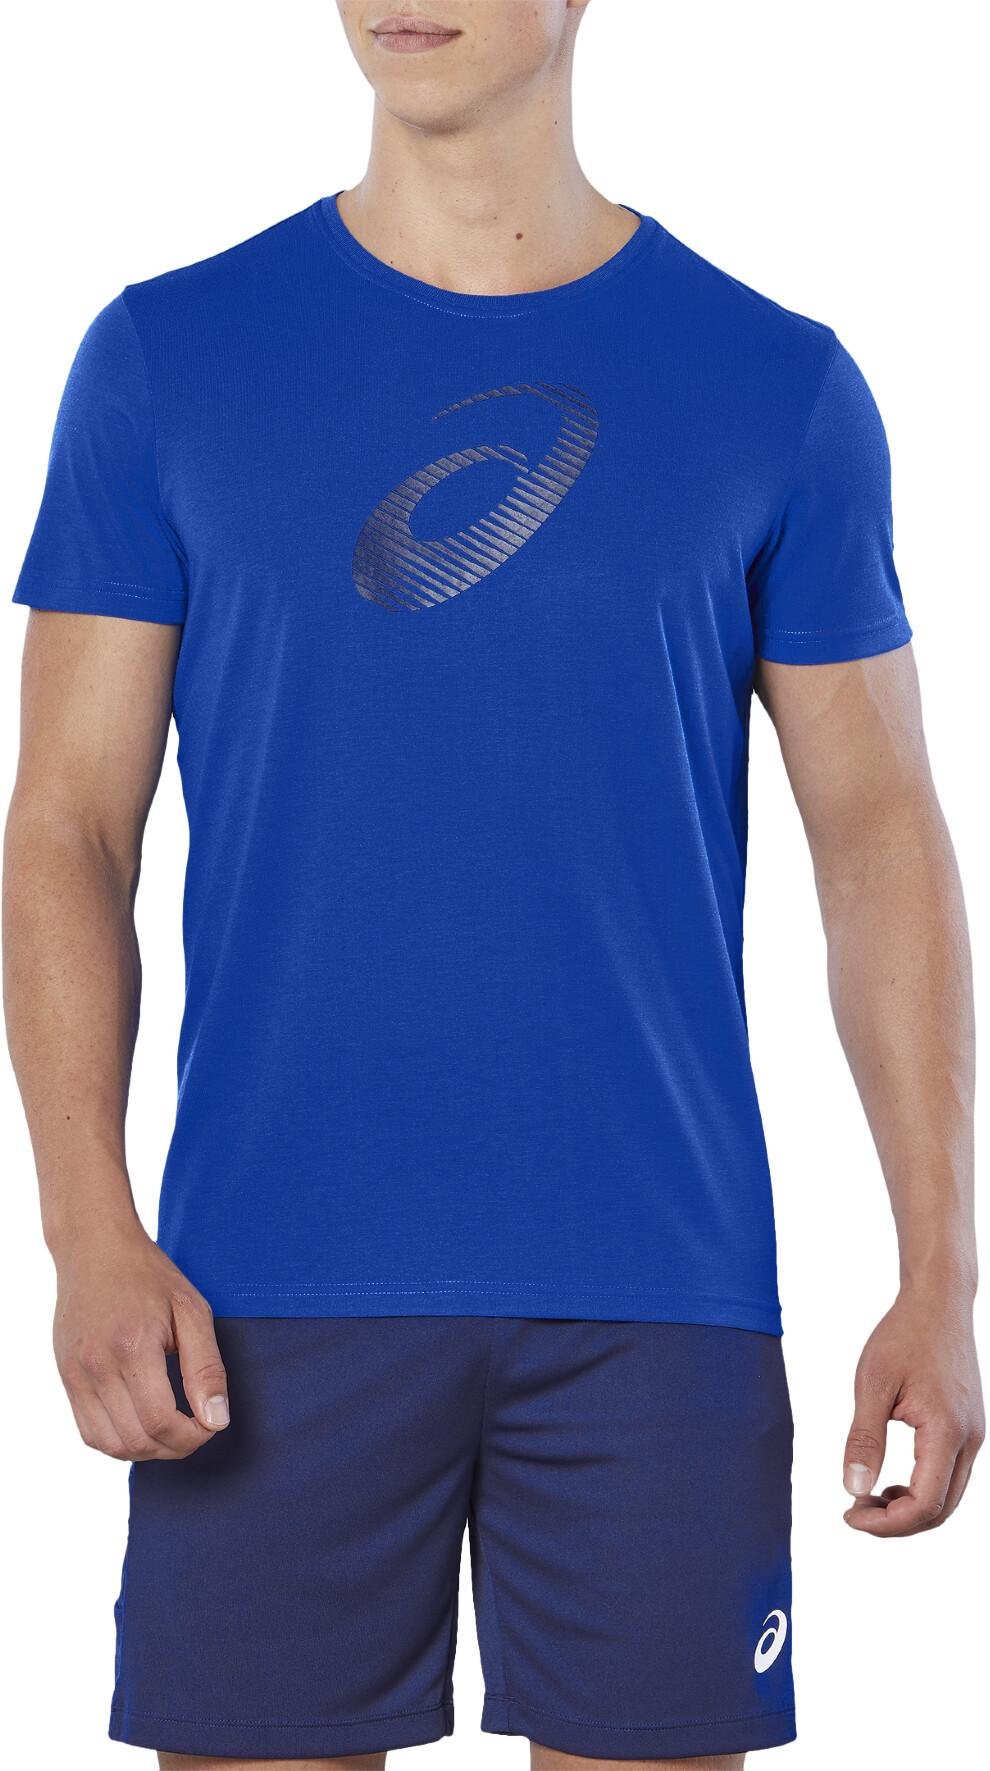 asics running shirt men